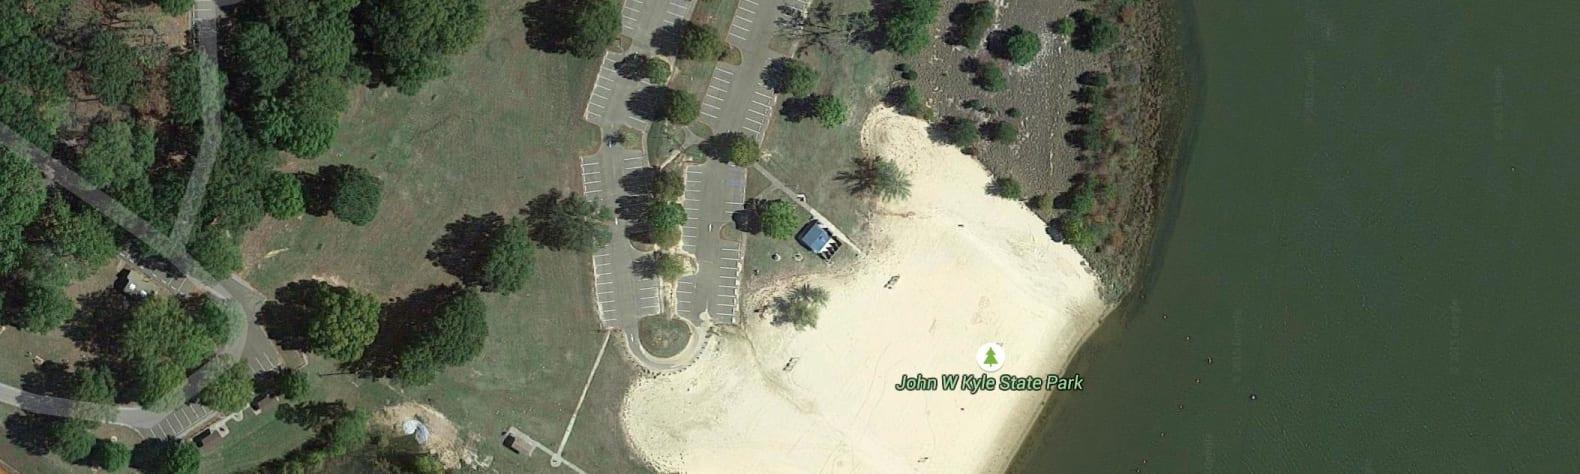 John W. Kyle State Park